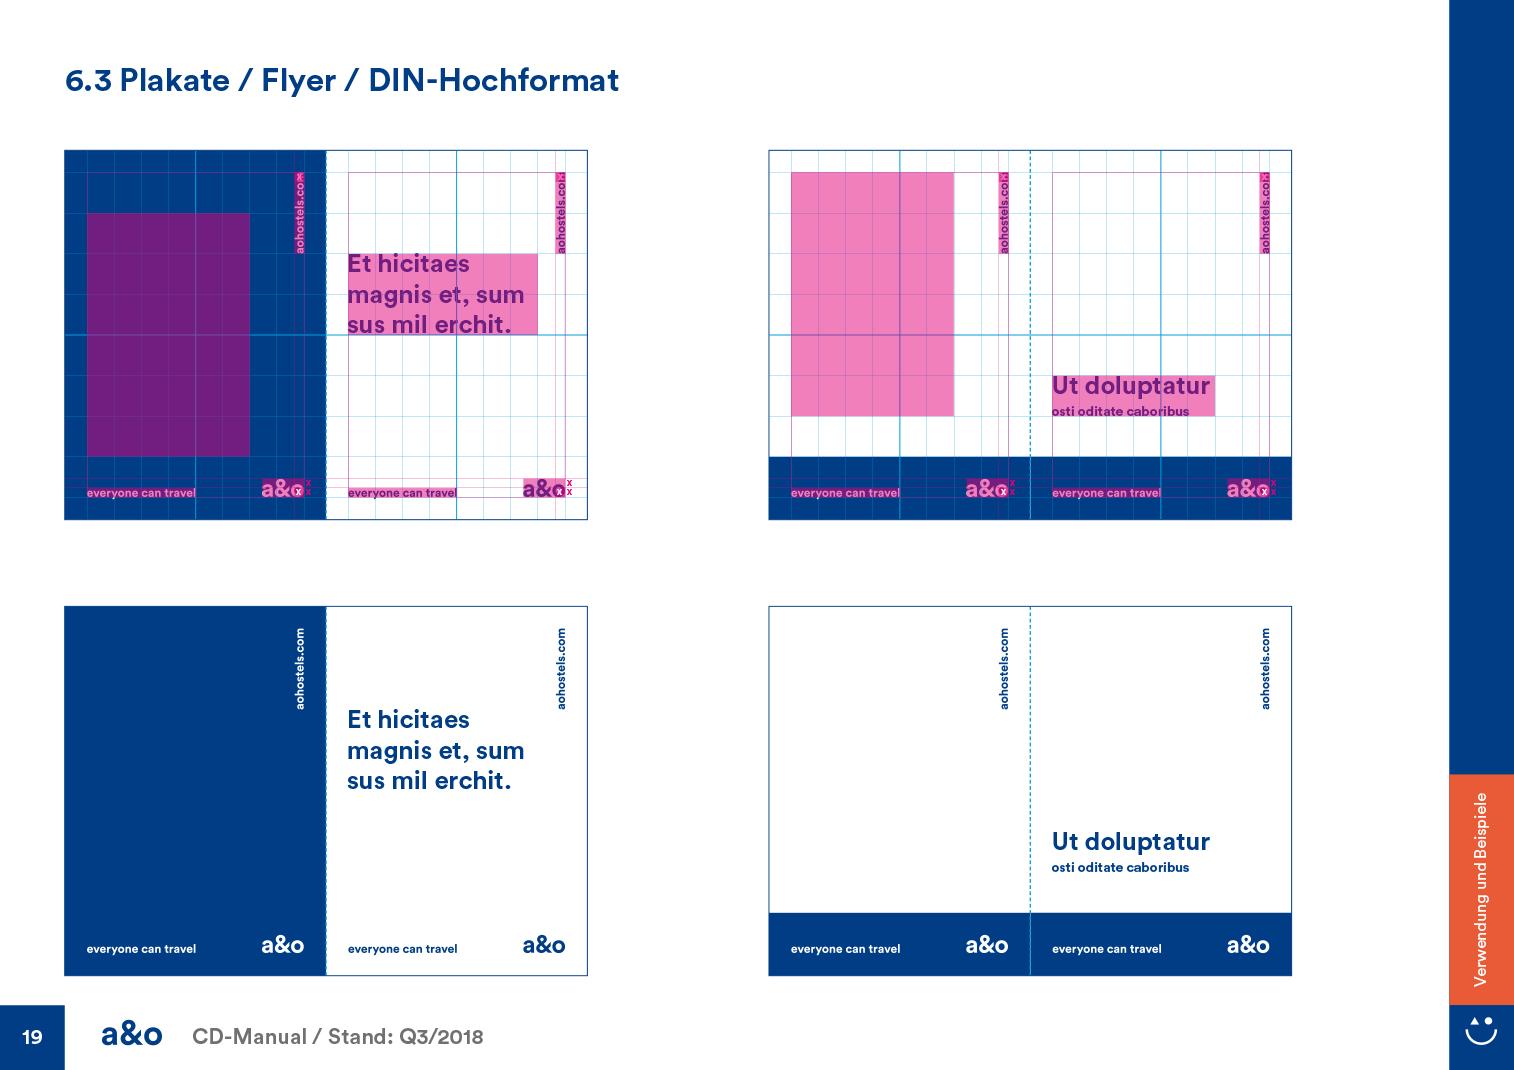 a & o CD Manual Detail Plakate